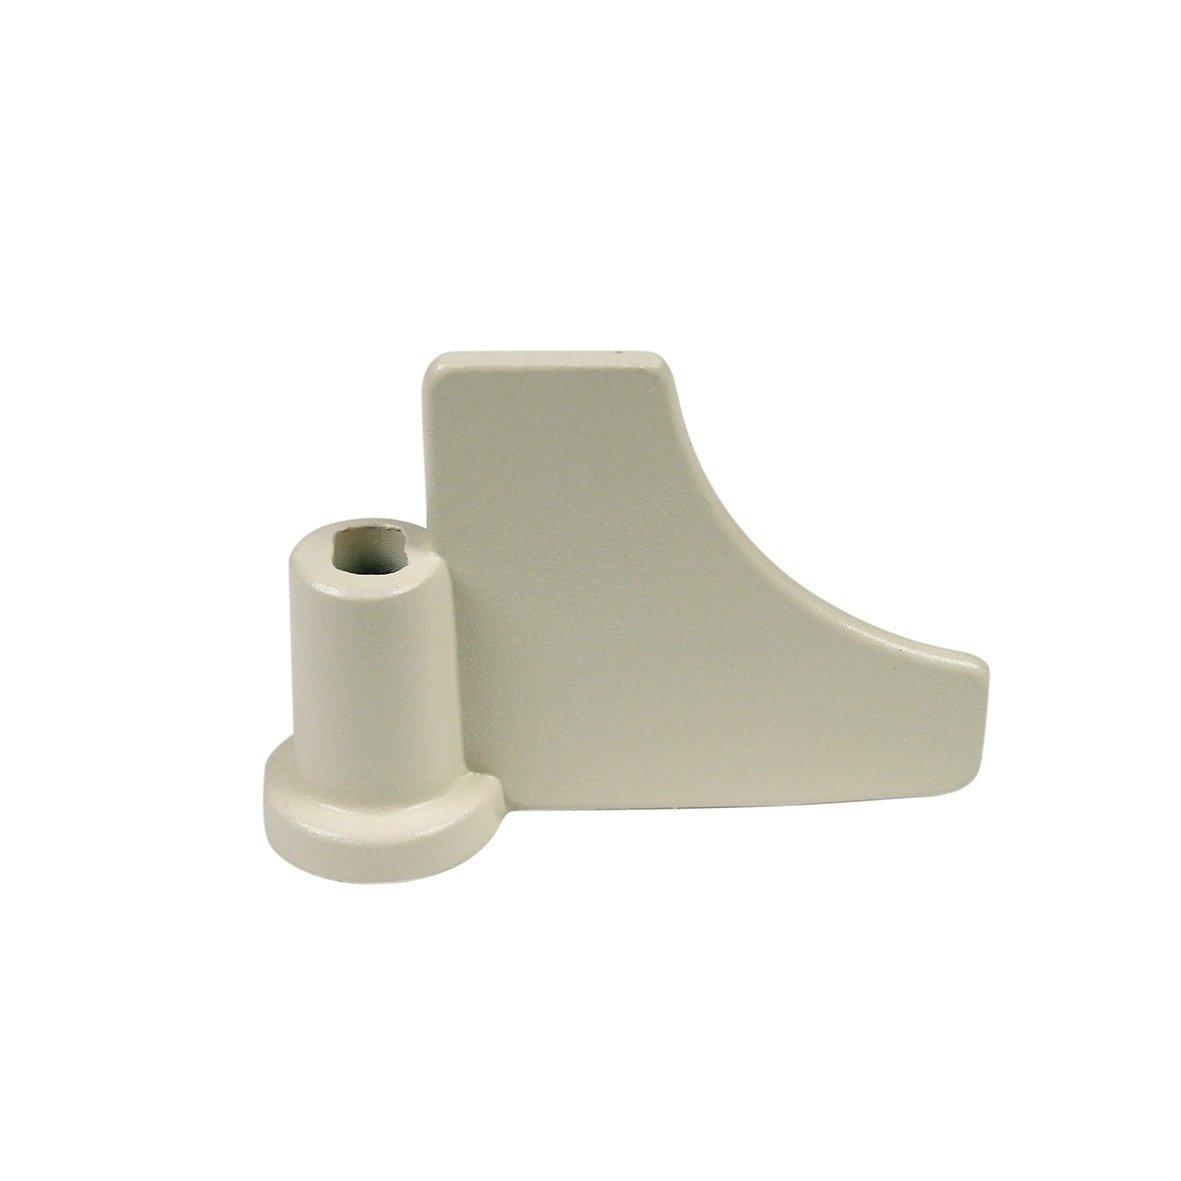 Unold con revestimiento de cerámica gancho para amasar para back Master Extra 68511 hornear pan máquina (6851172)